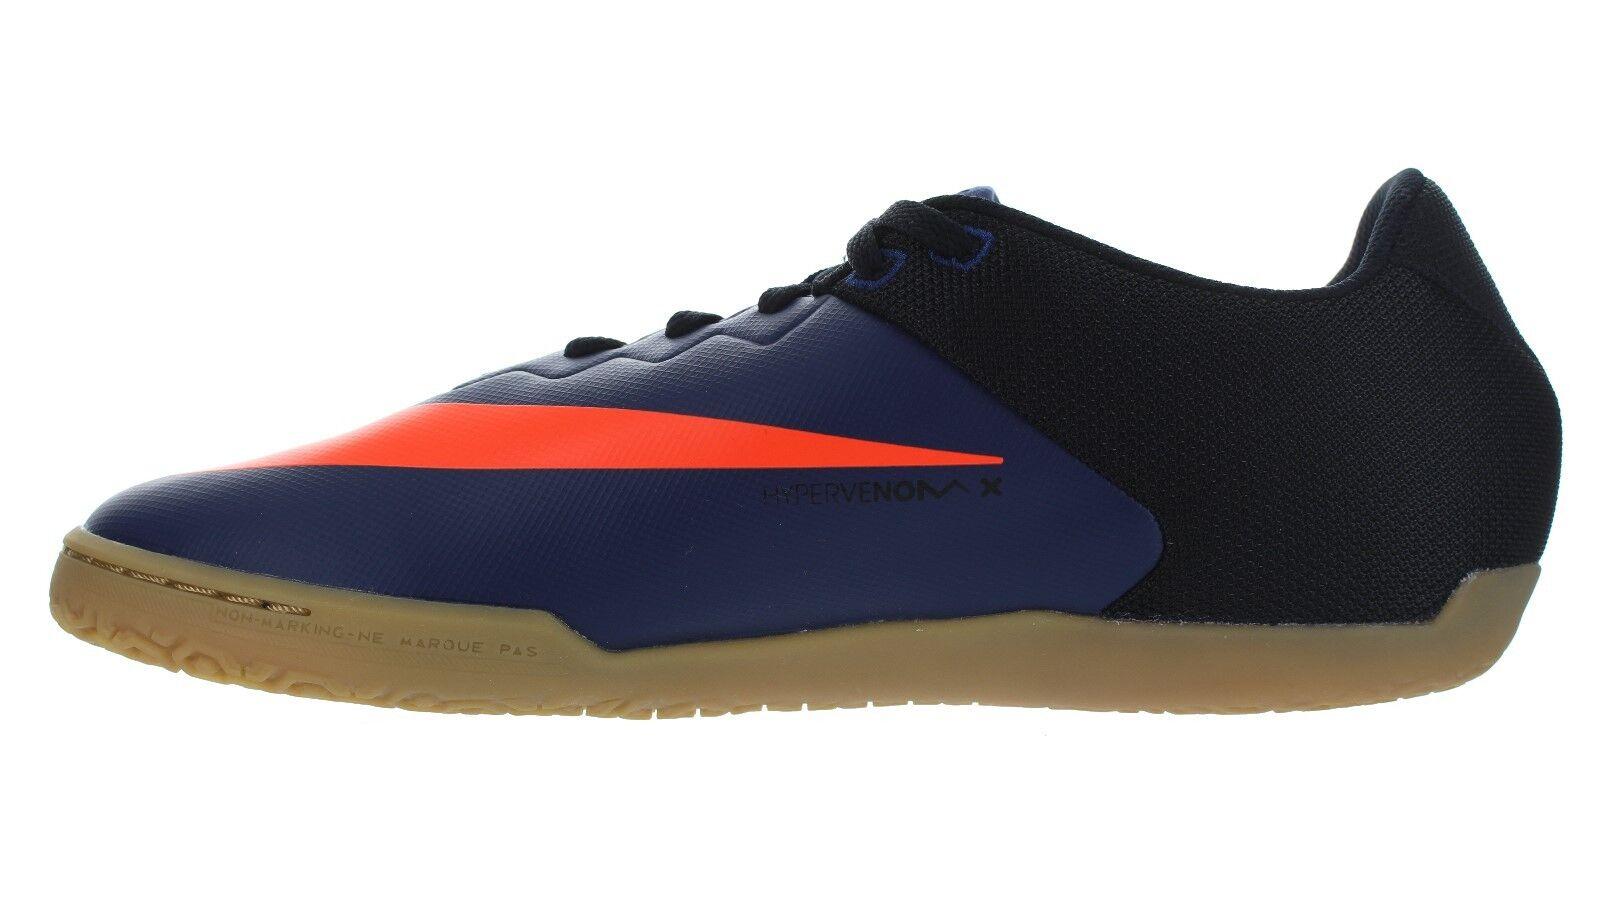 best service 29887 995c2 ... clearance nike hombre hypervenomx pro ic navy naranja zapatos de fútbol  temporada múltiples comodo precio de